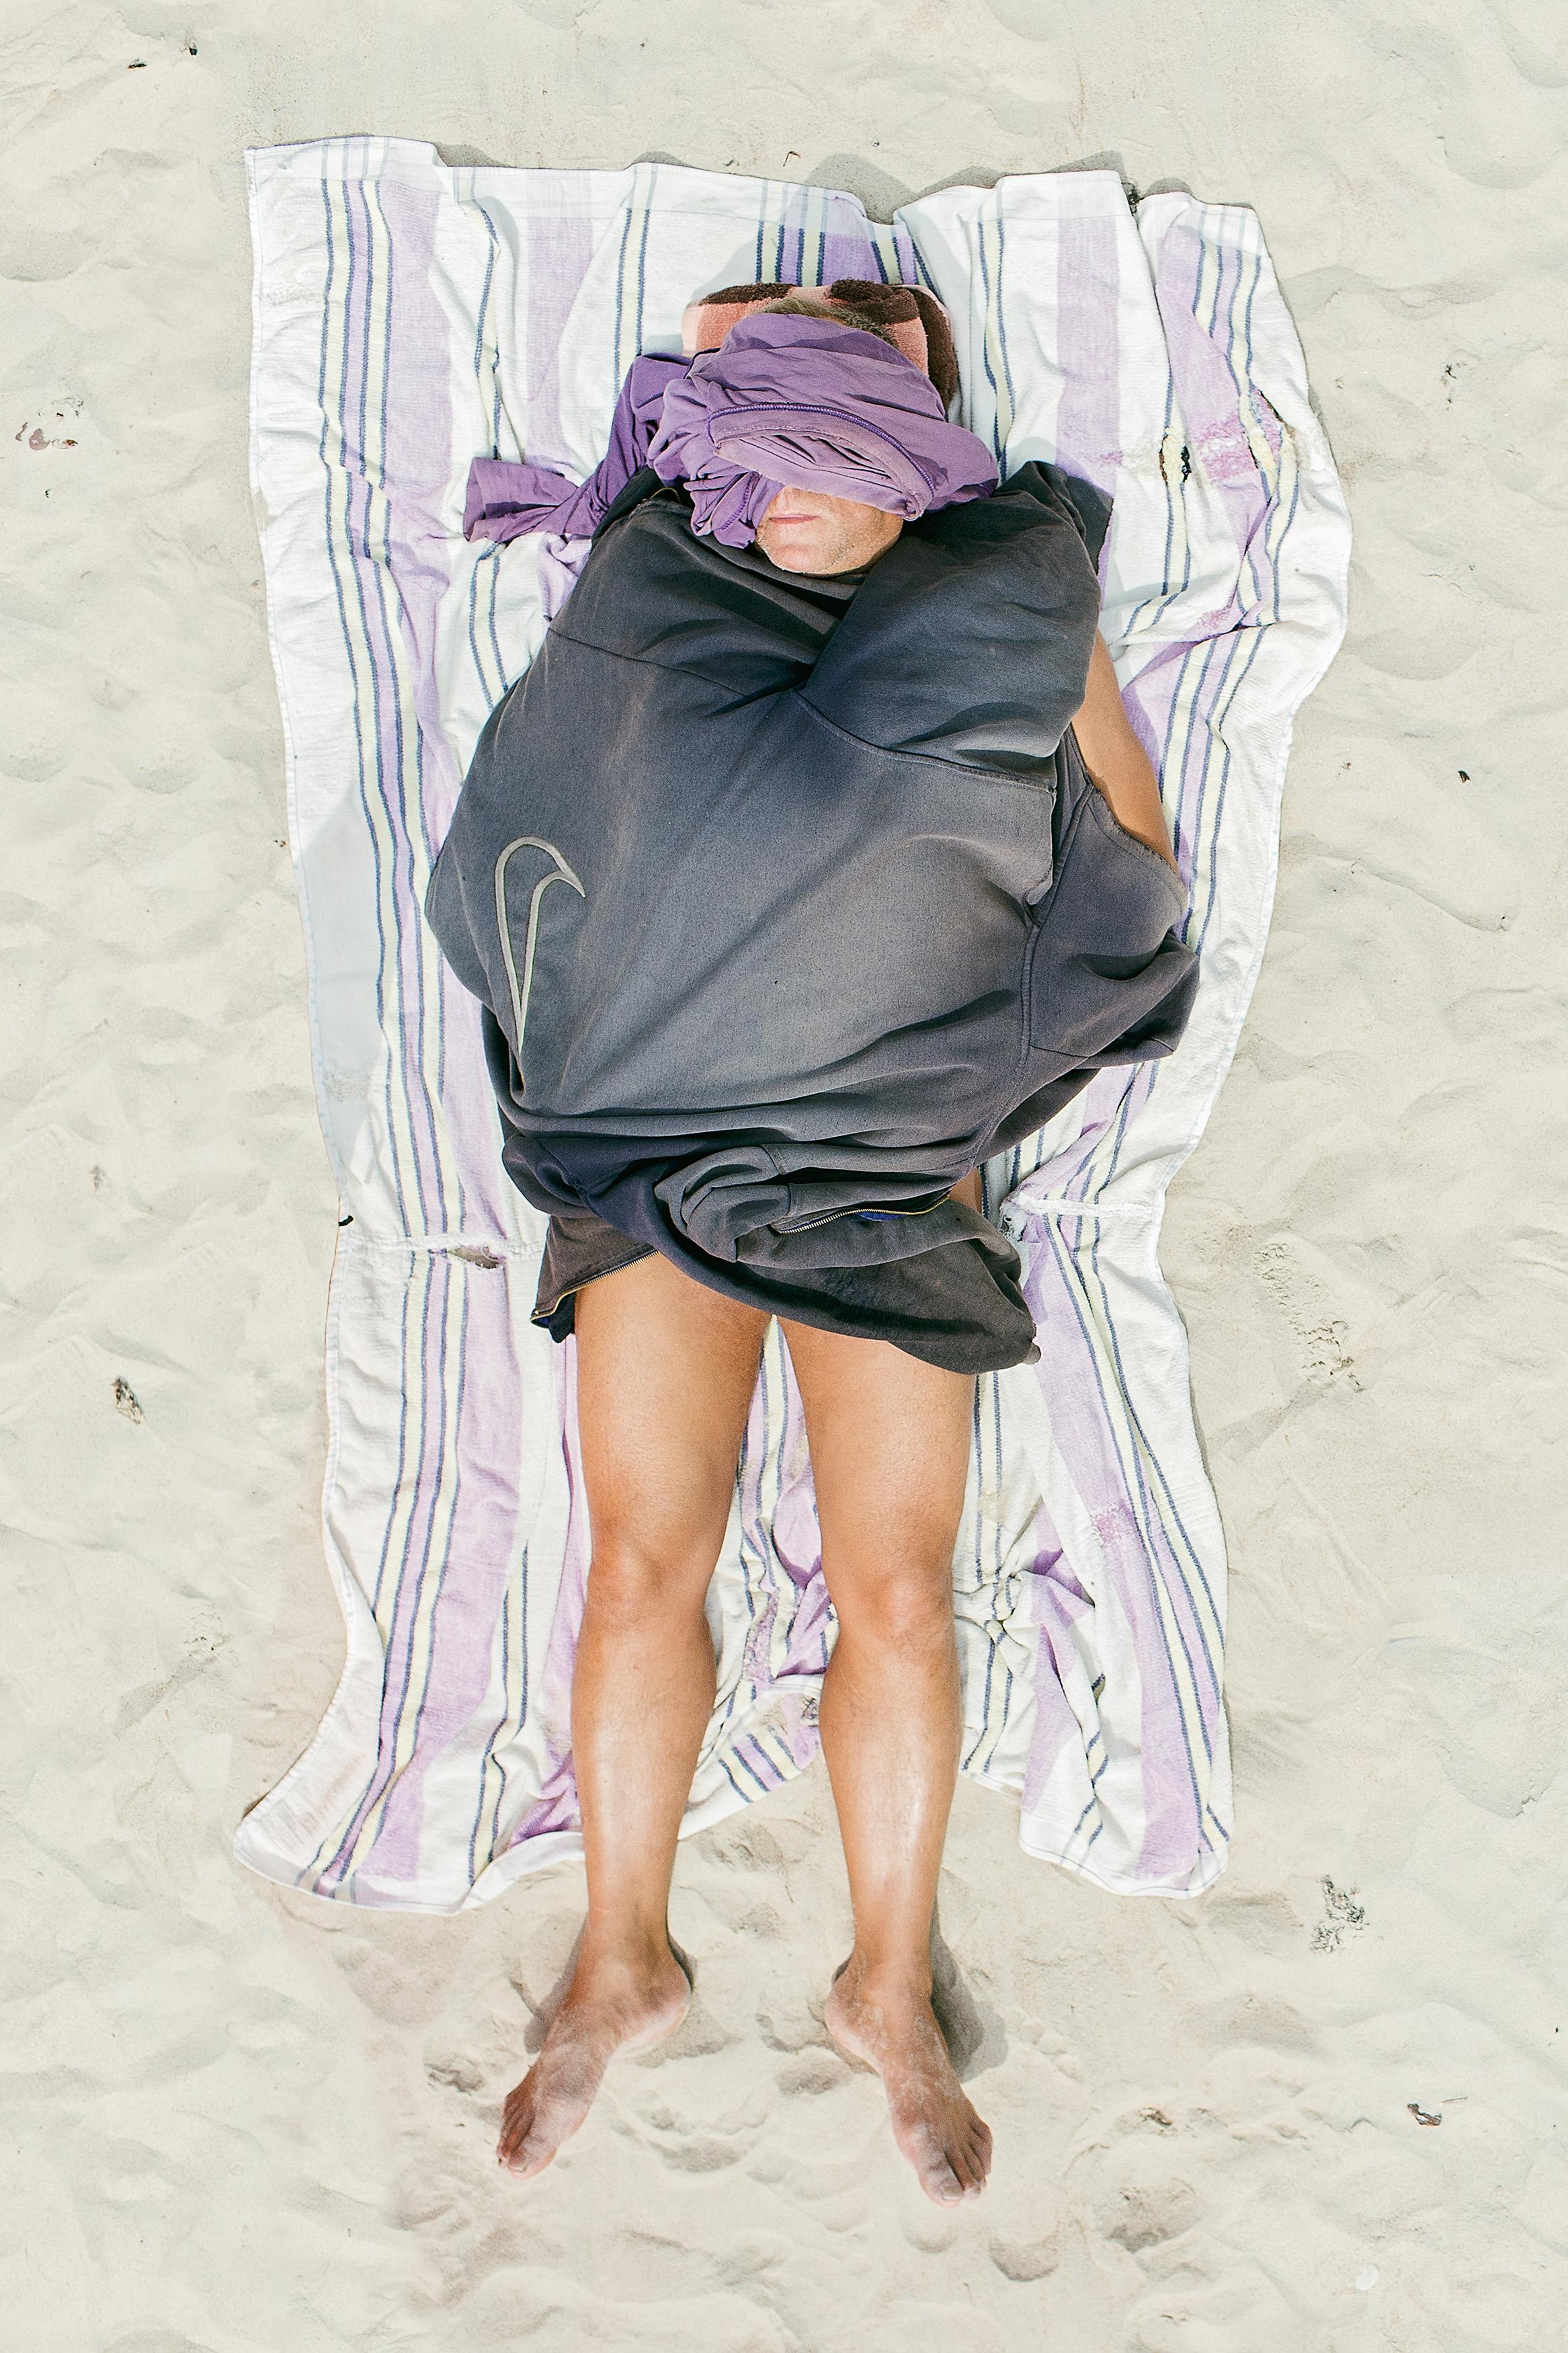 man op strandlaken op zand